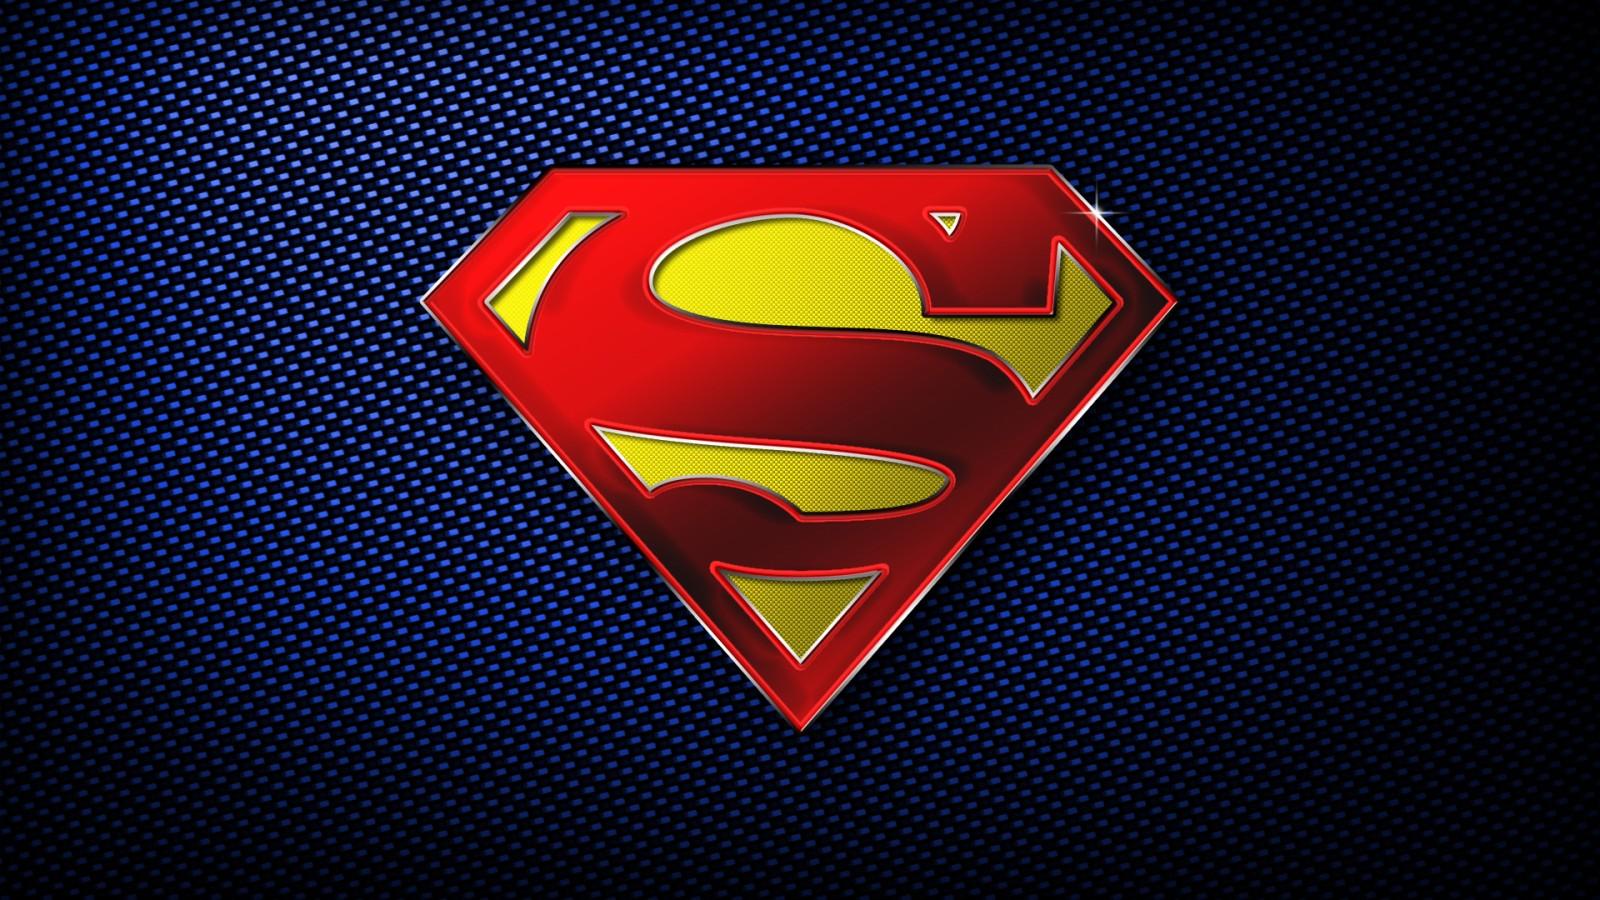 Hd wallpaper superman - Superman Logo Hd Wallpapers 1080p